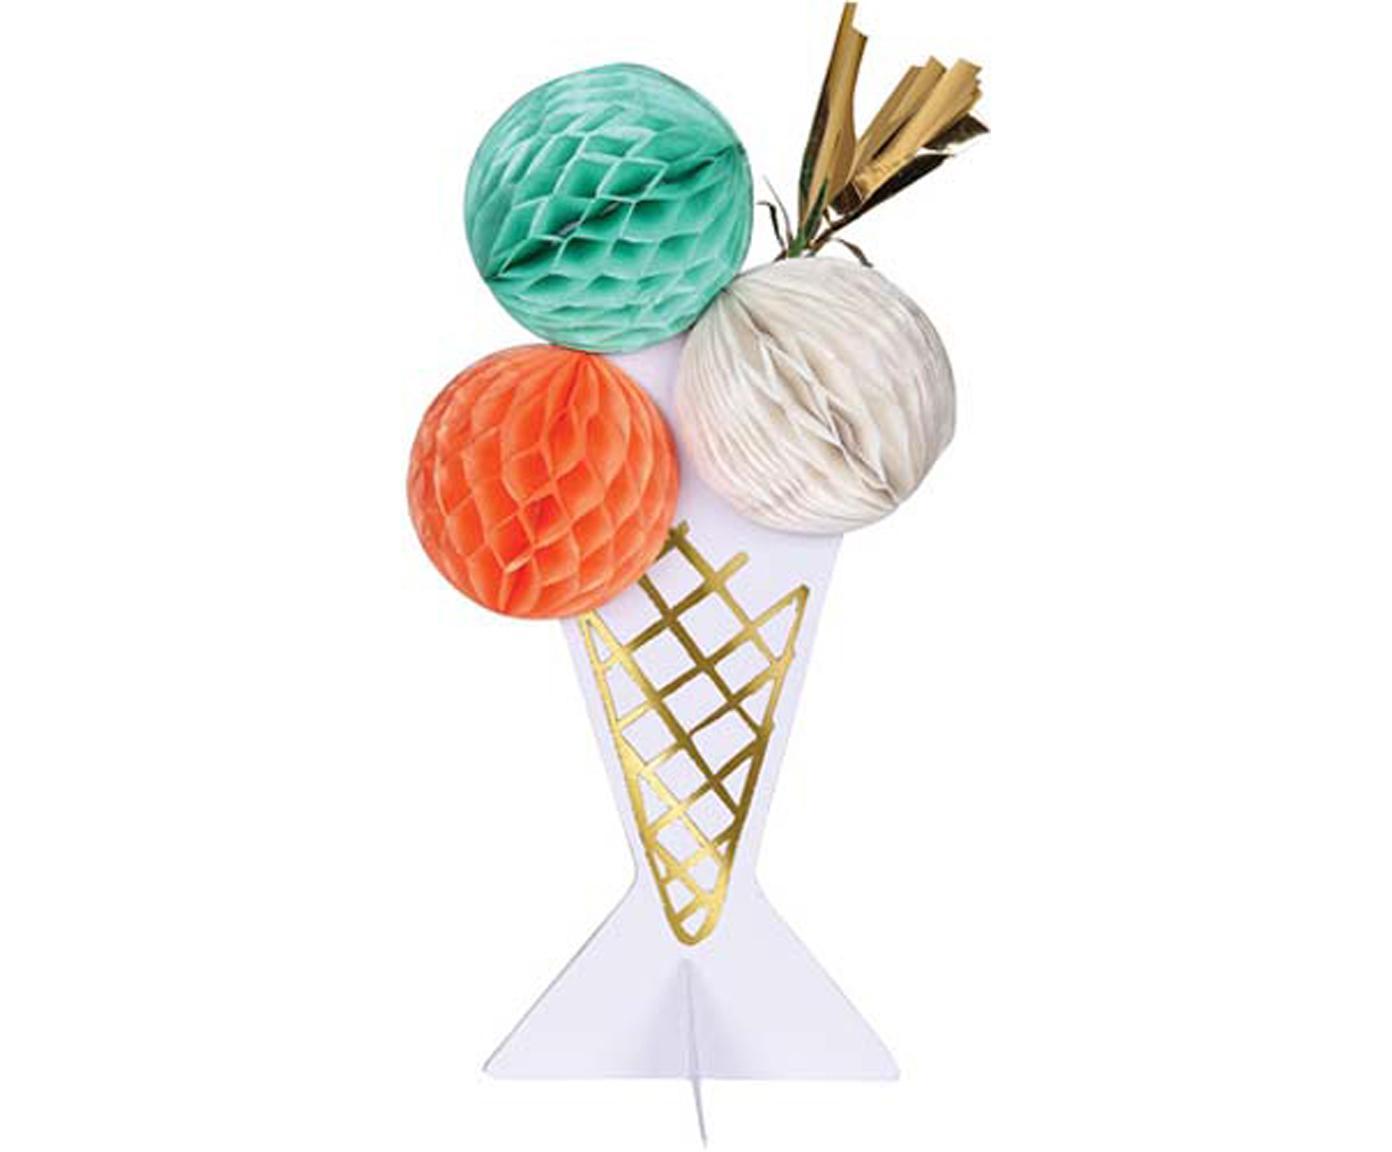 Tajerta de cumpleaños Ice Cream, Papel, Rosa, blanco, verde menta, dorado, L 13 x An 19 cm